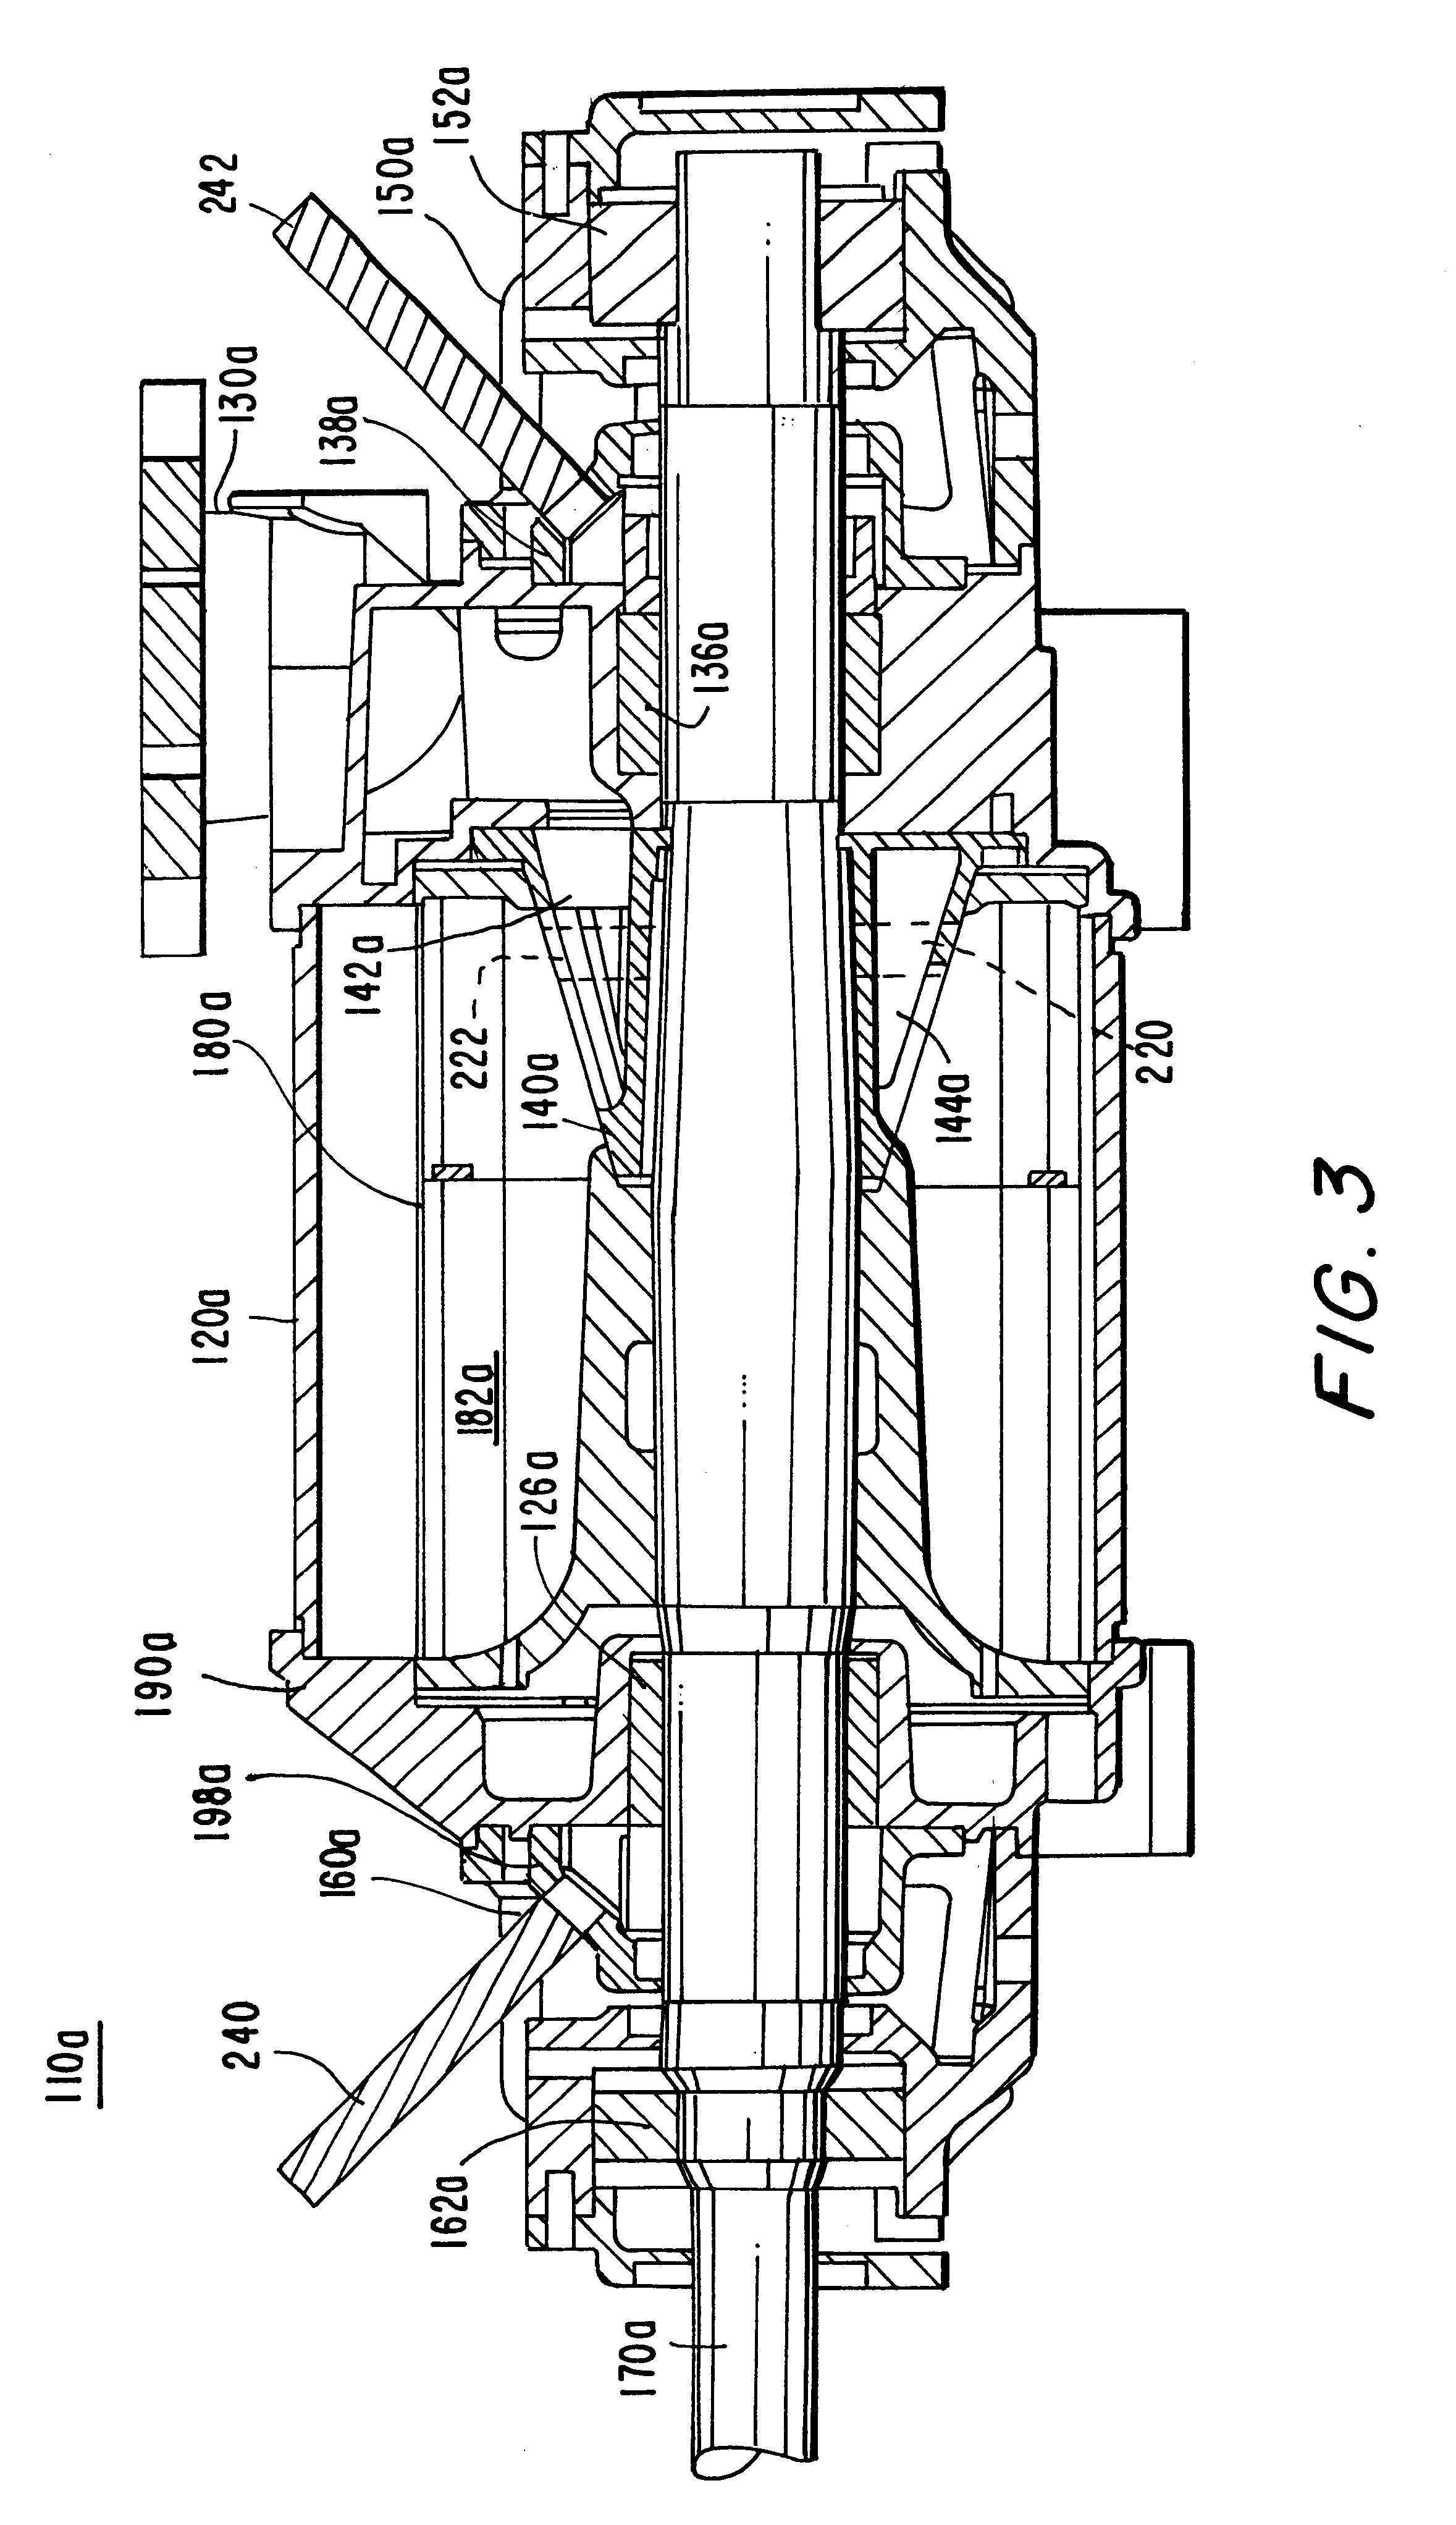 busch vacuum pump wiring diagram busch vacuum pump